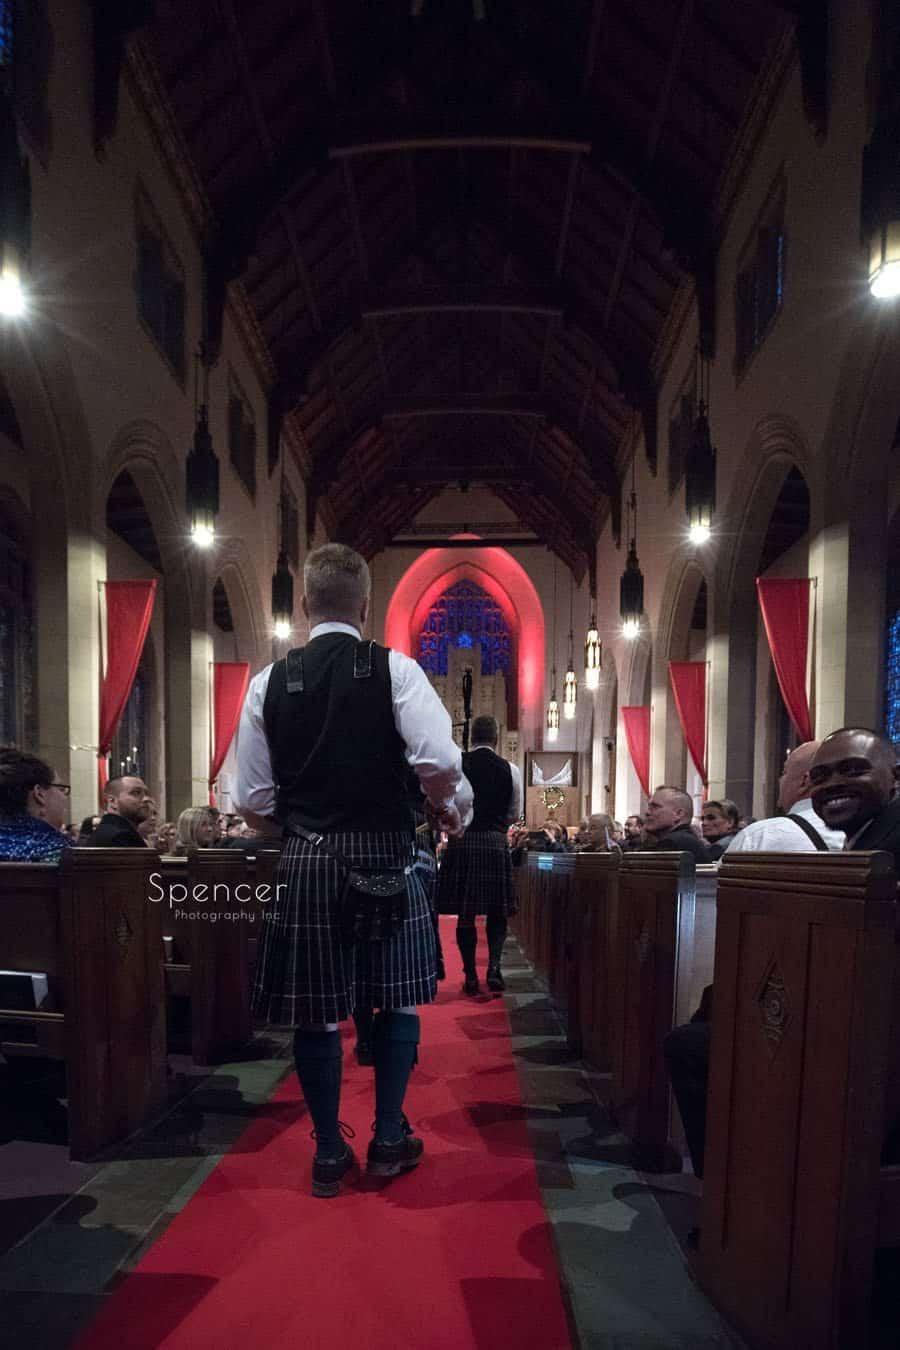 pipe band enter christmas wedding at first baptist church